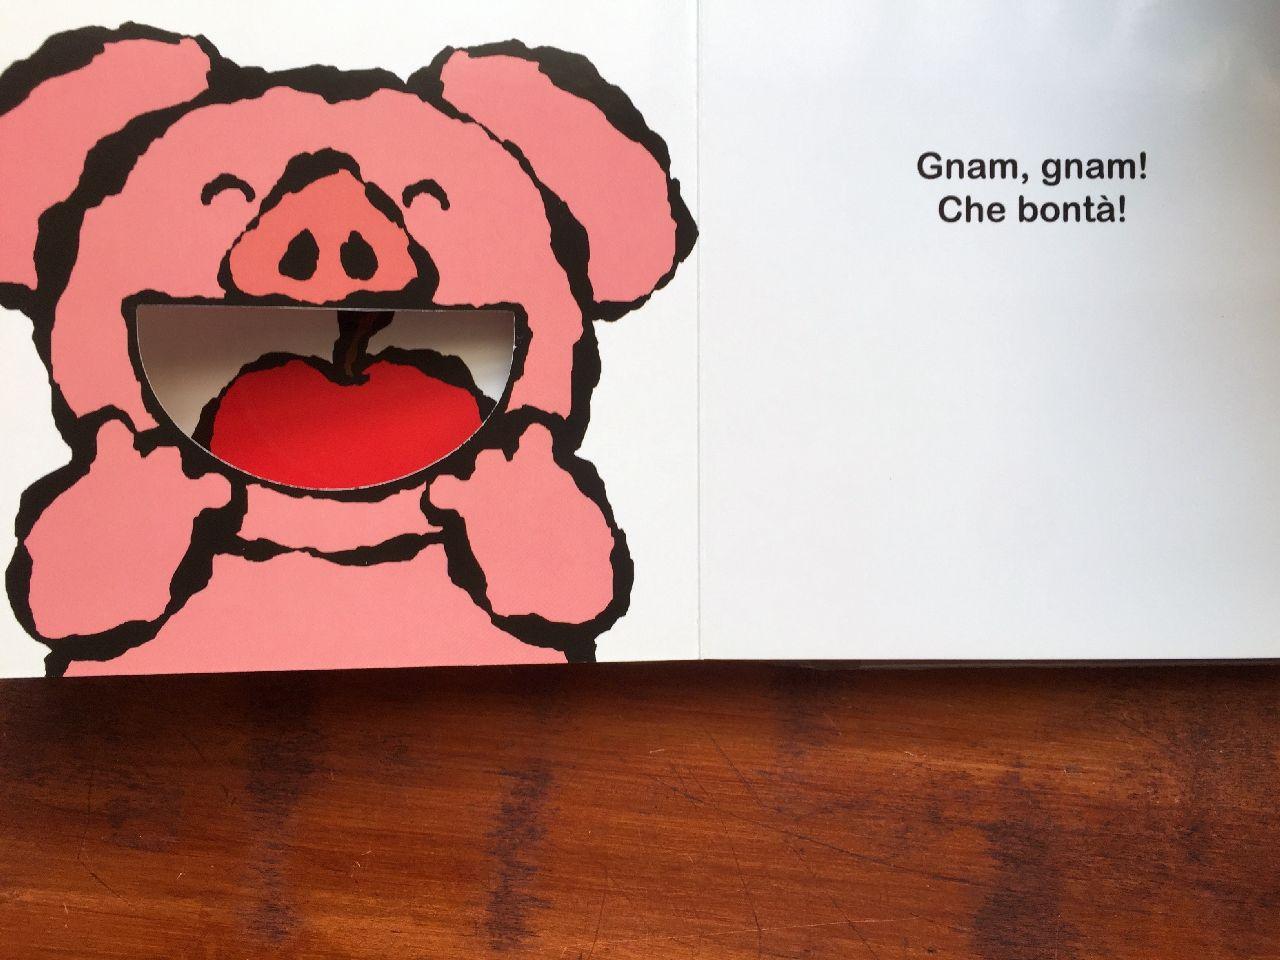 Yusuke Yonezu, Gnam! A me piace, Minedition